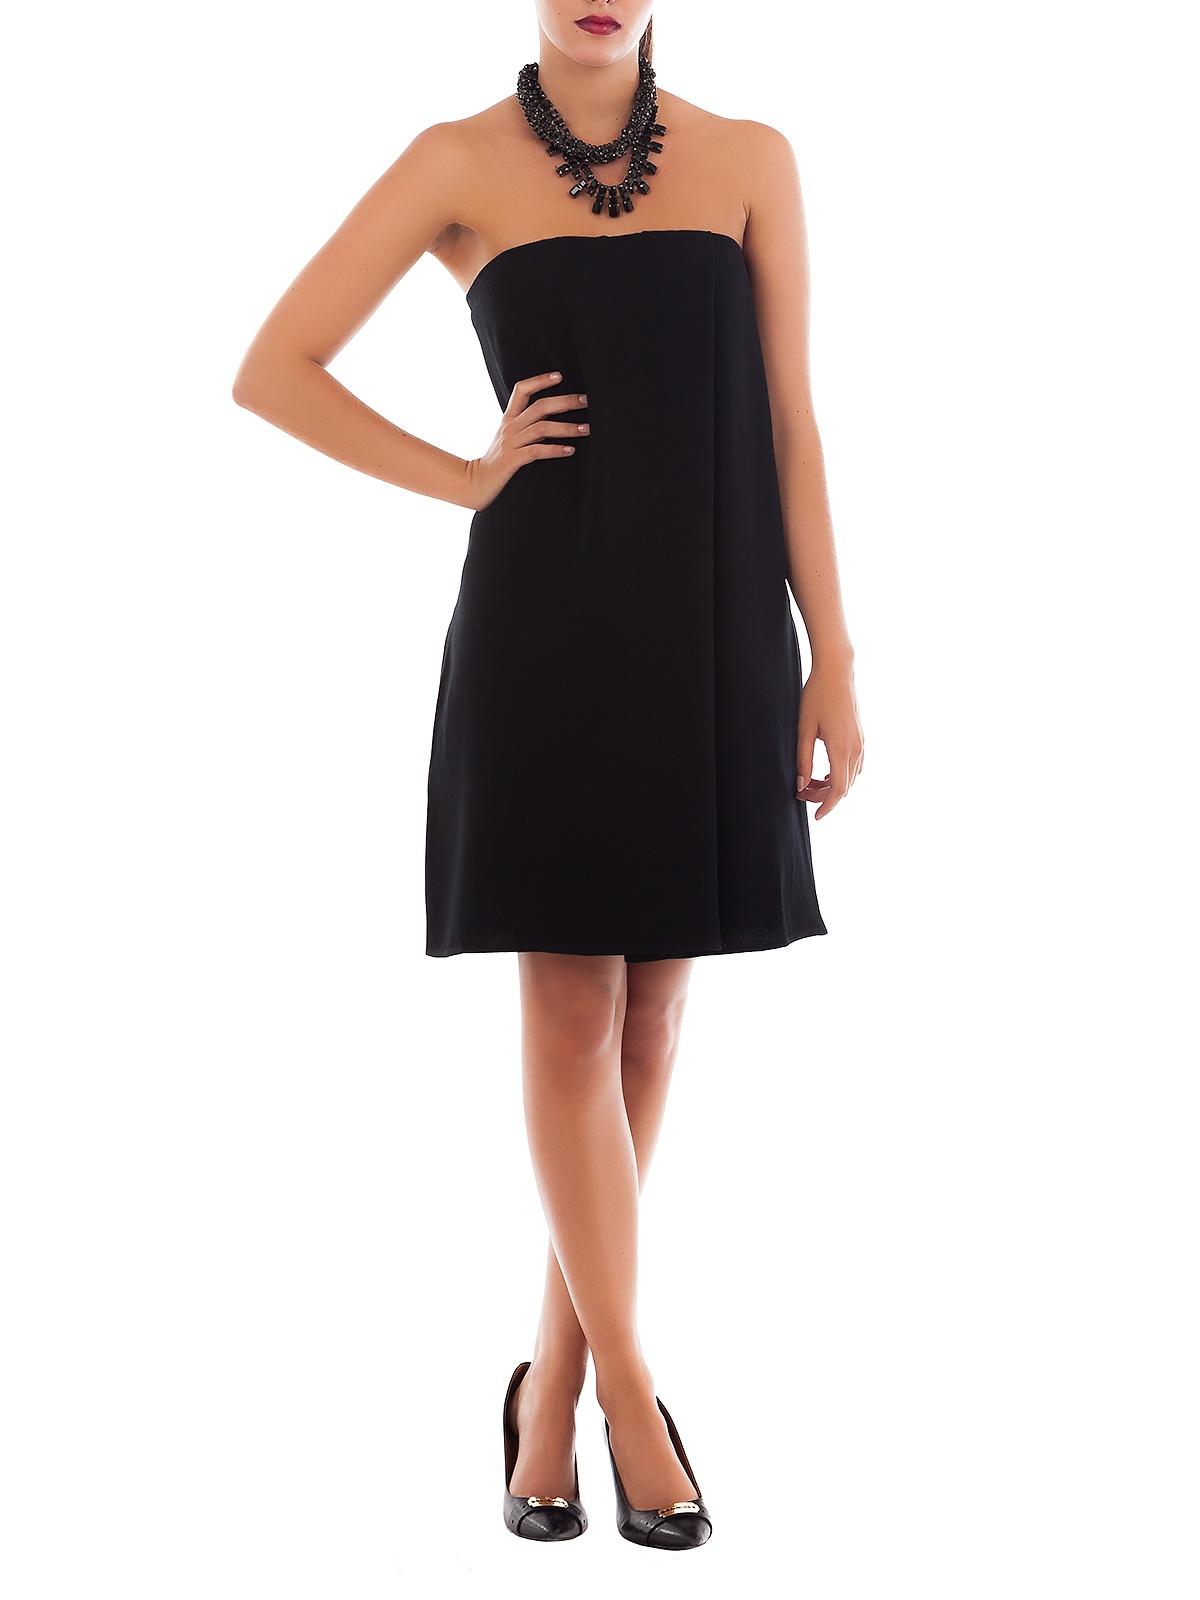 PIONNI BLACK NECKLACE | GIRISSIMA.COM - Collectible fashion to love and to last